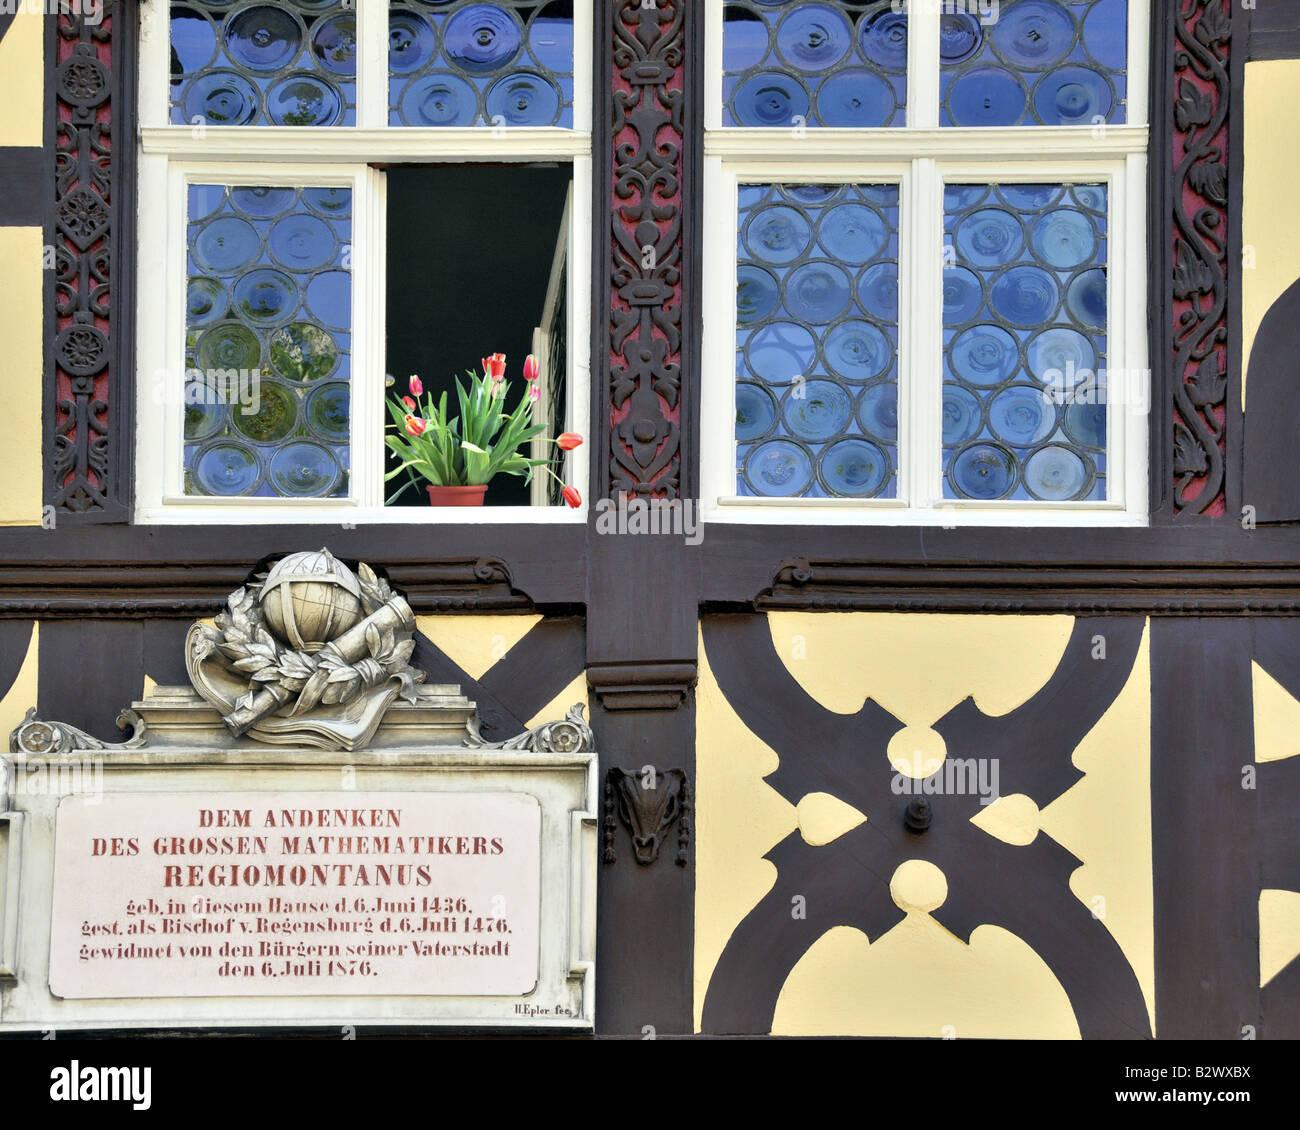 DE - BAVARIA - UPPER FRANCONIA: Birthplace of Regiomontanus (Mathematician) in Königsberg-in-Bayern - Stock Image